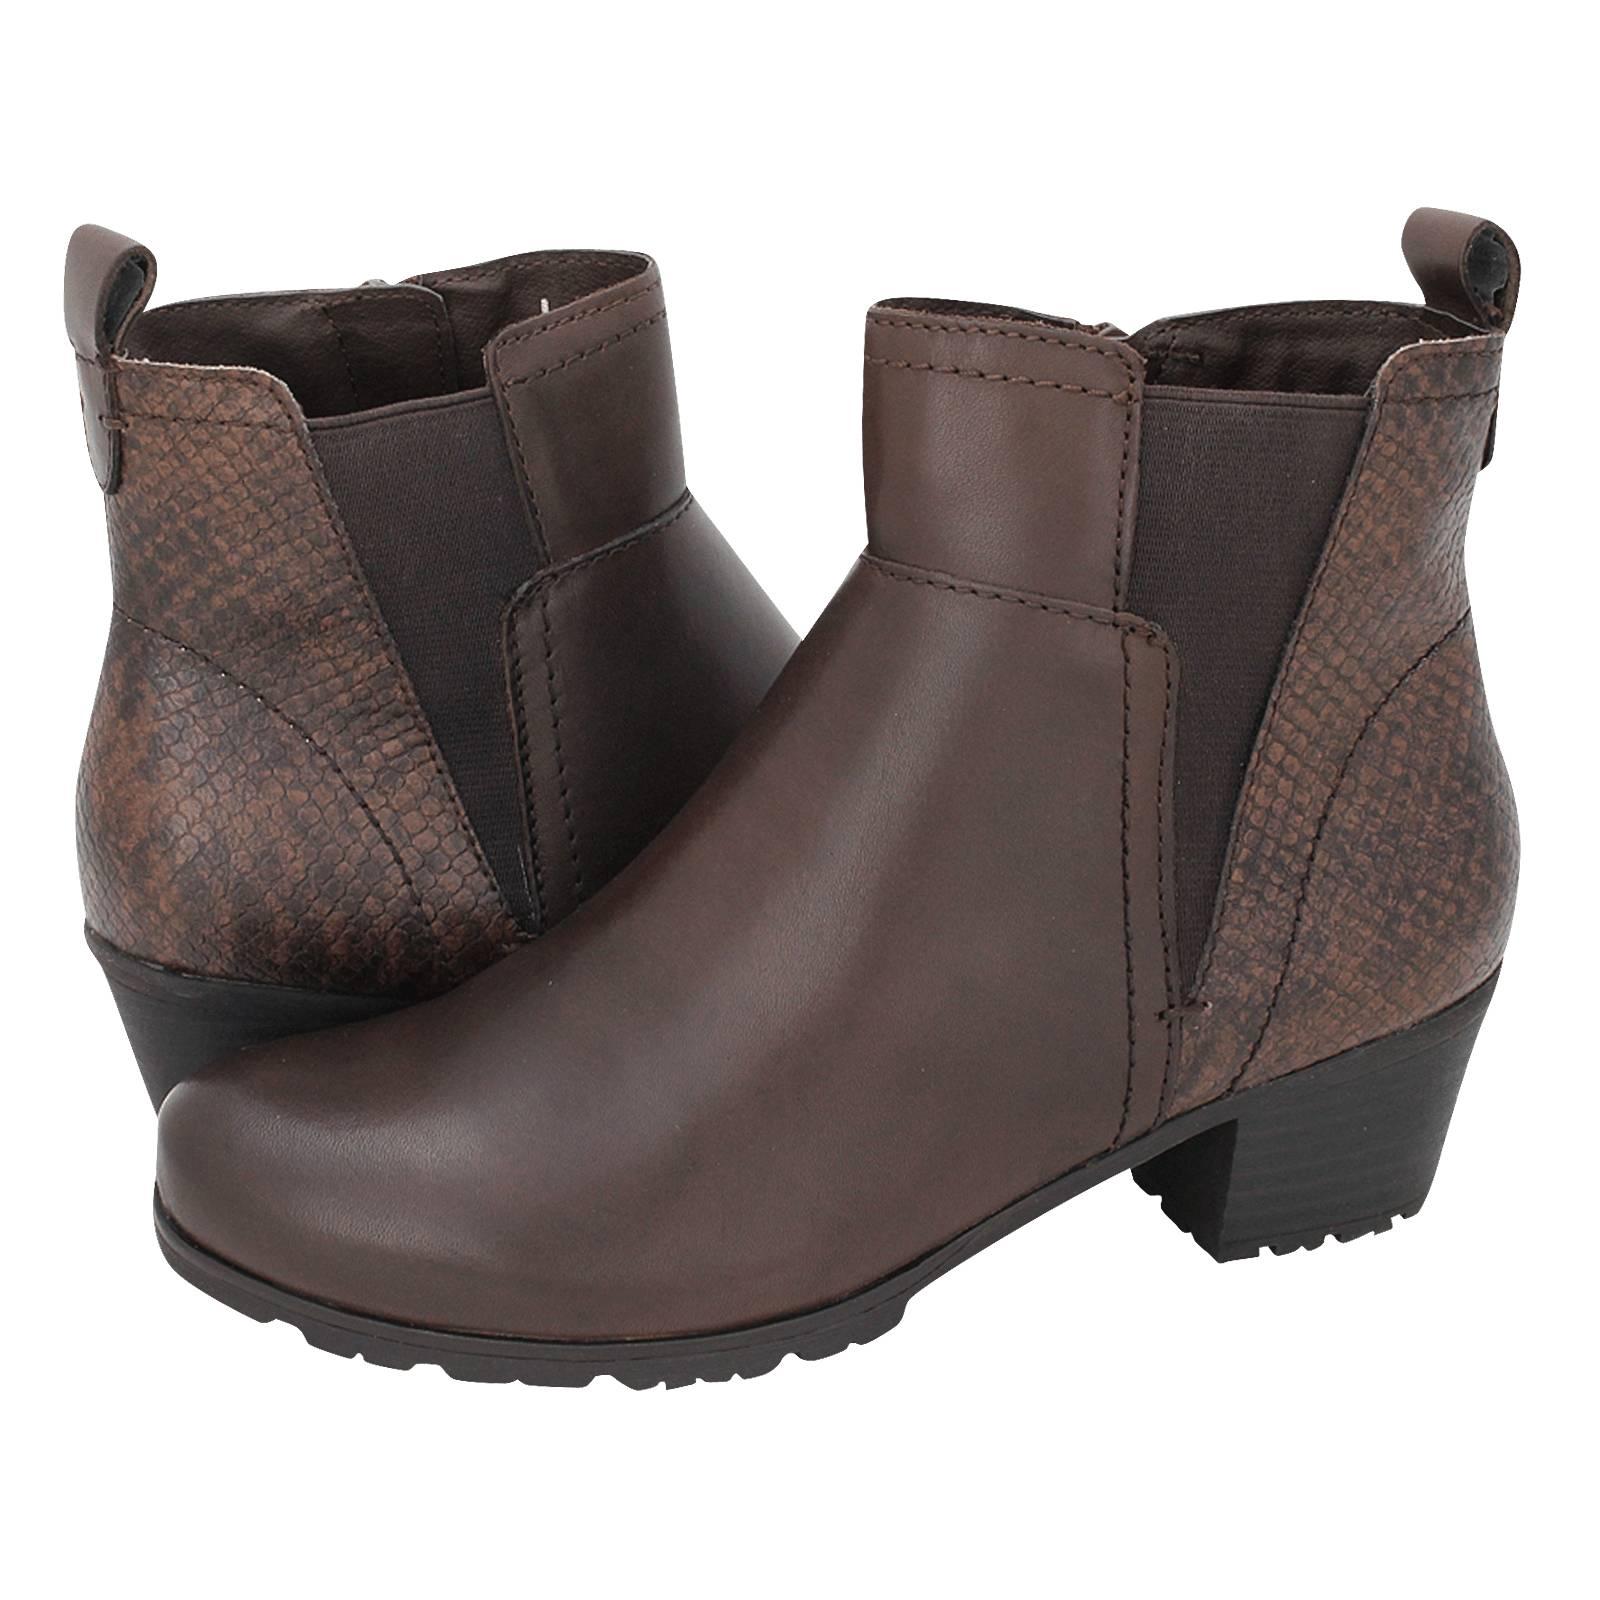 promo code 71485 9067e Jana Trinita low boots